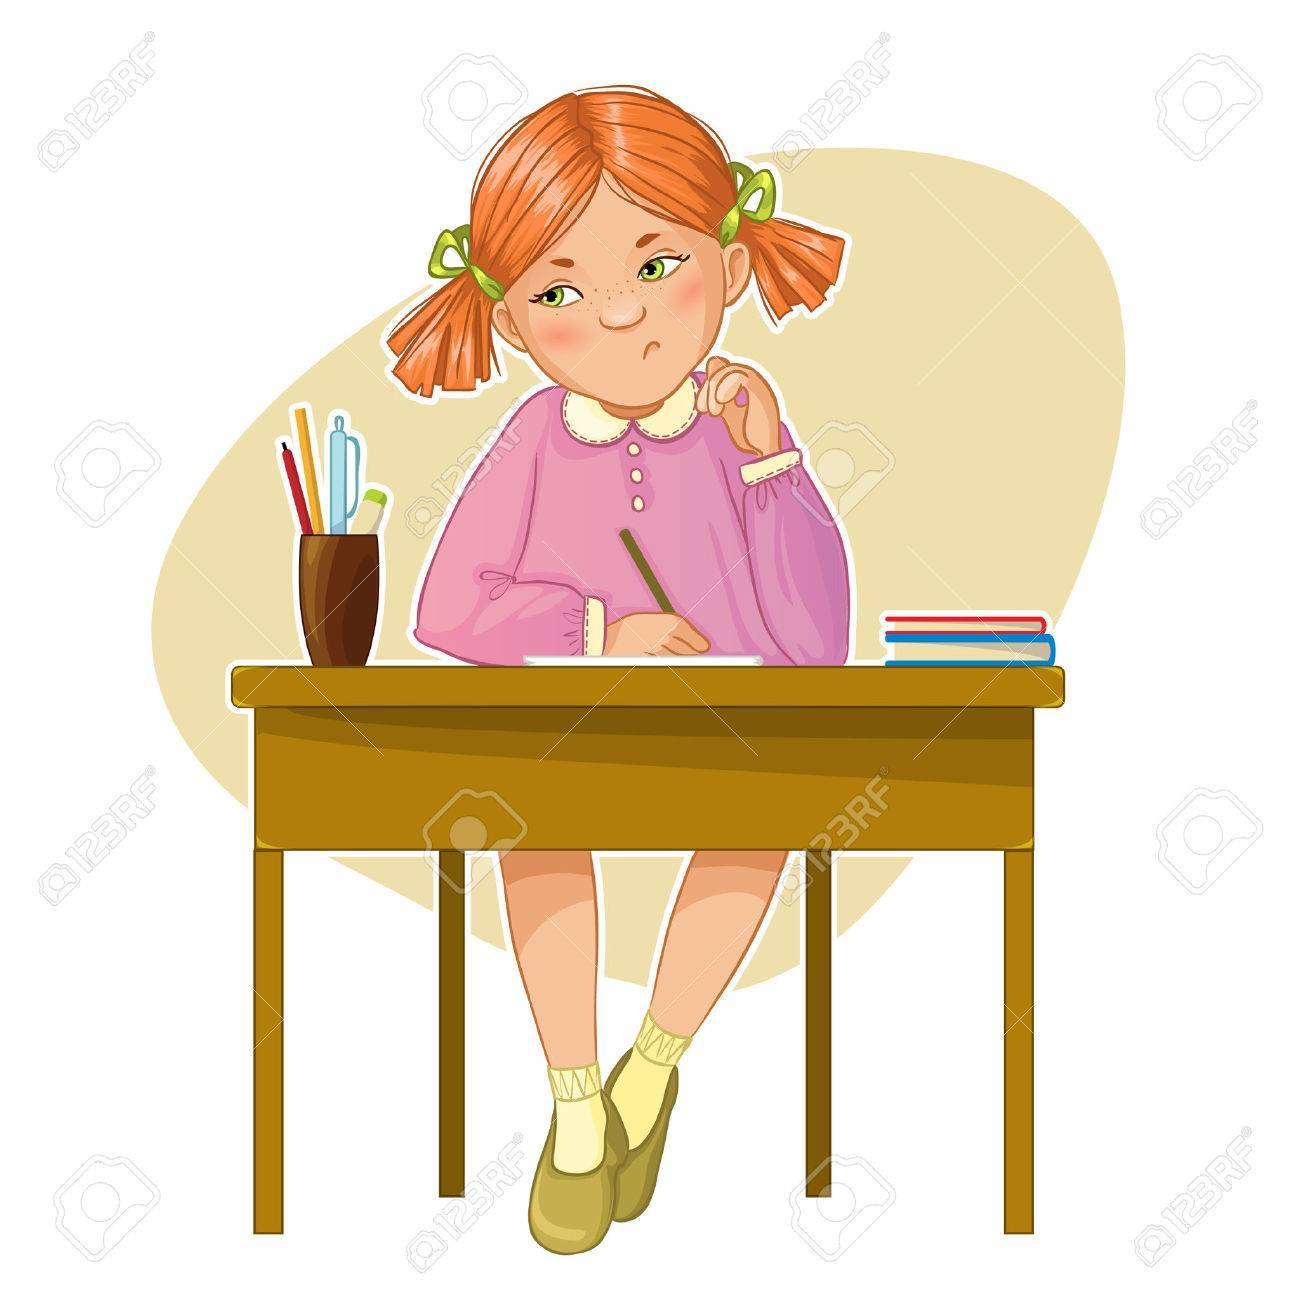 Girl sitting at desk clipart 2 » Clipart Portal.